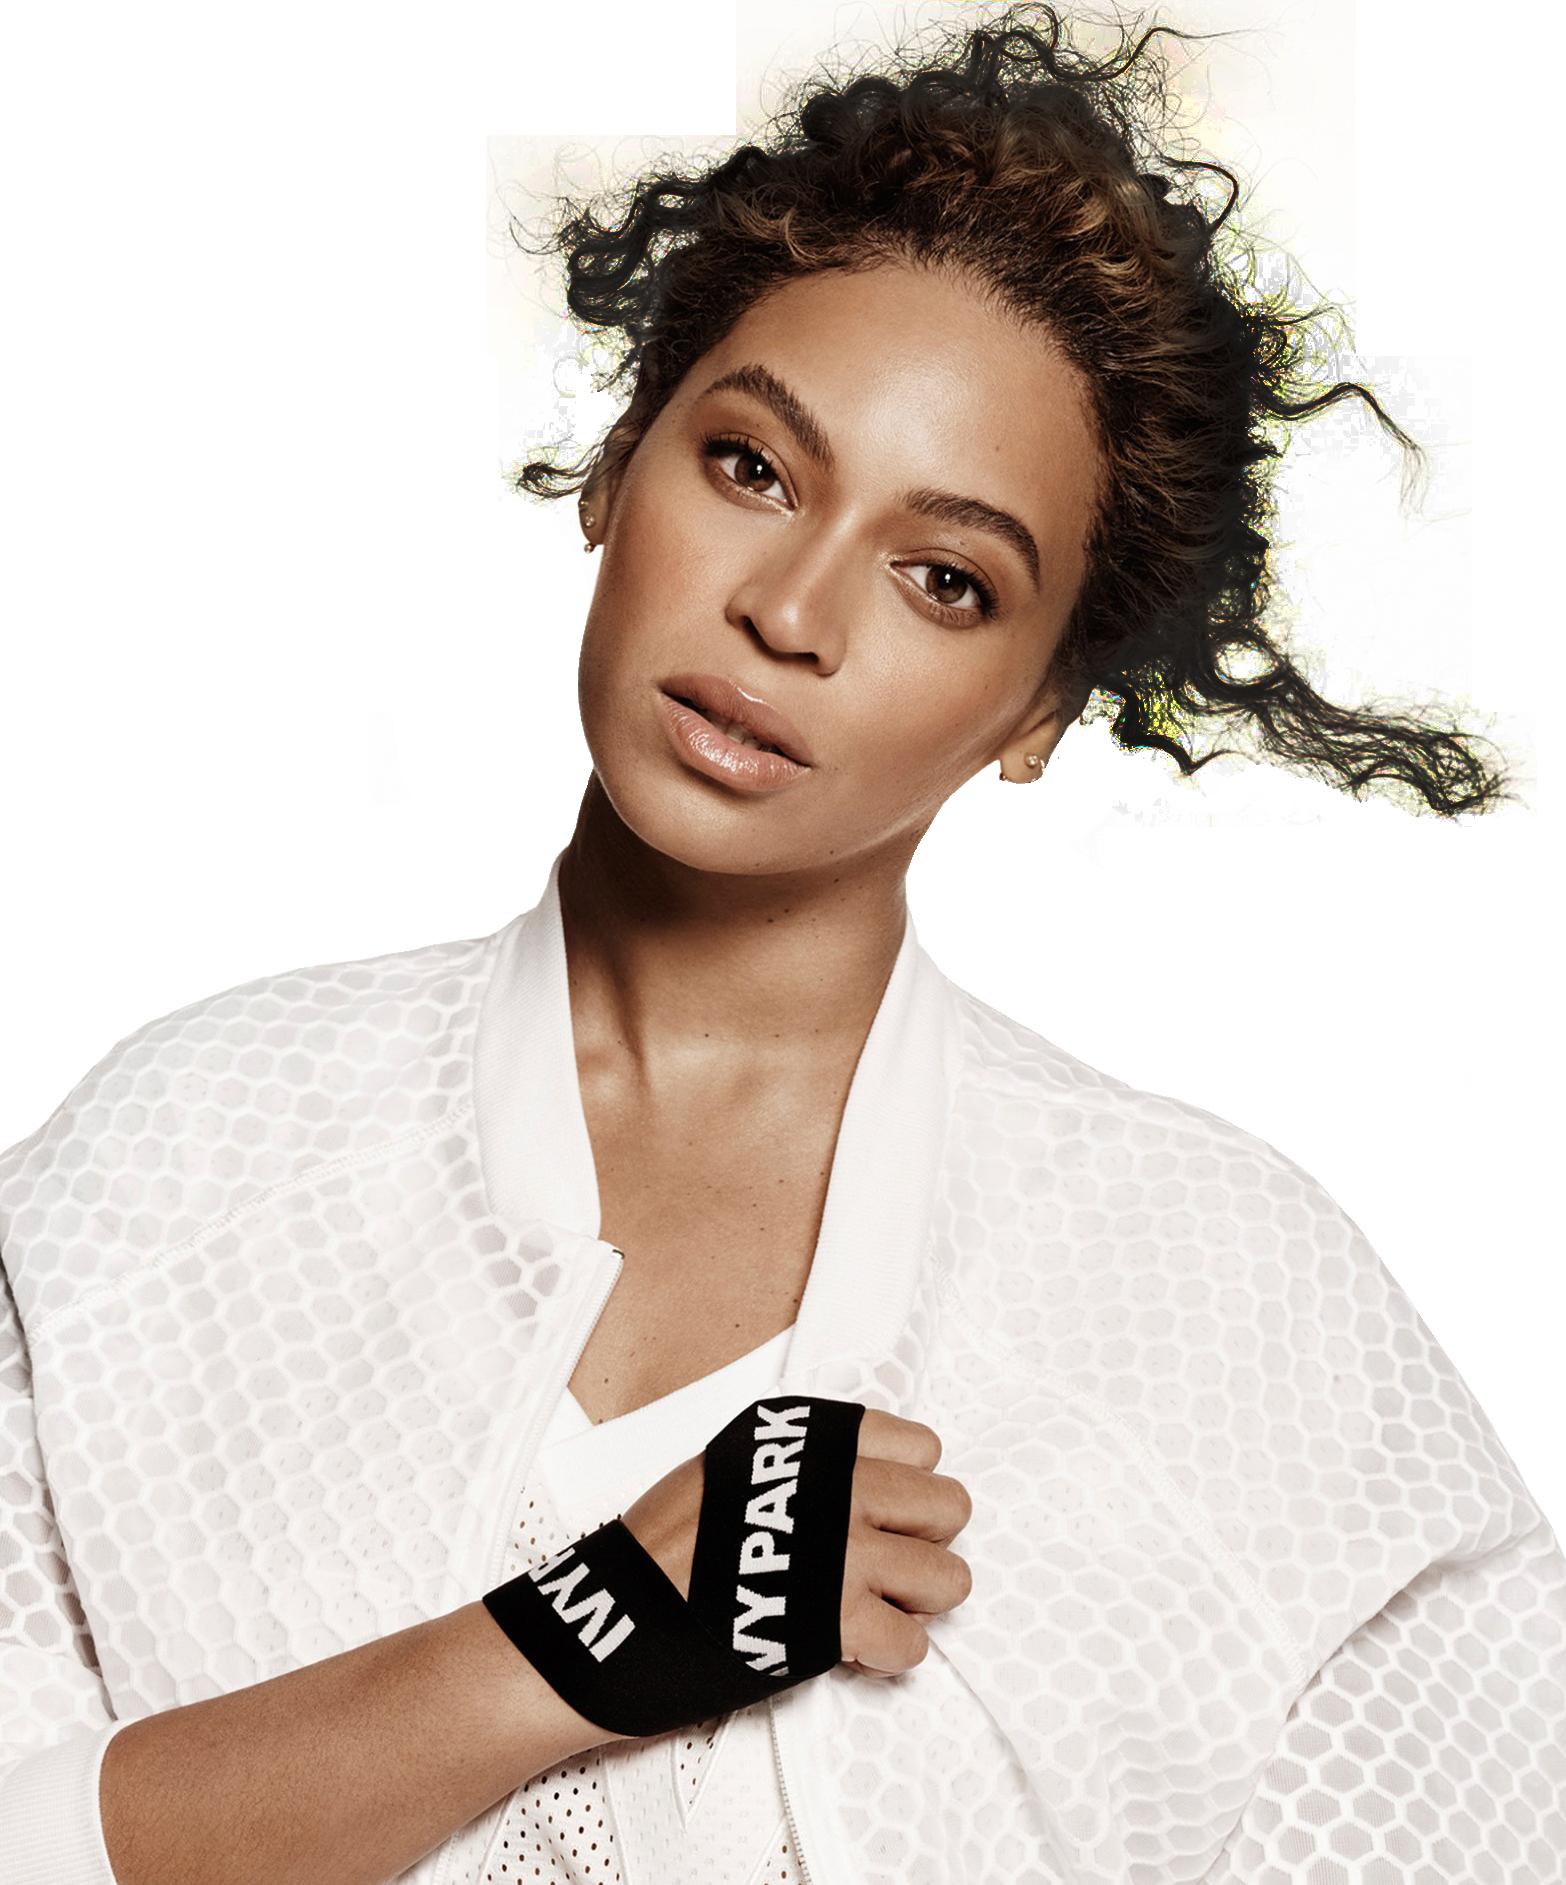 Beyonce Knowles PNG File-Beyonce Knowles PNG File-11